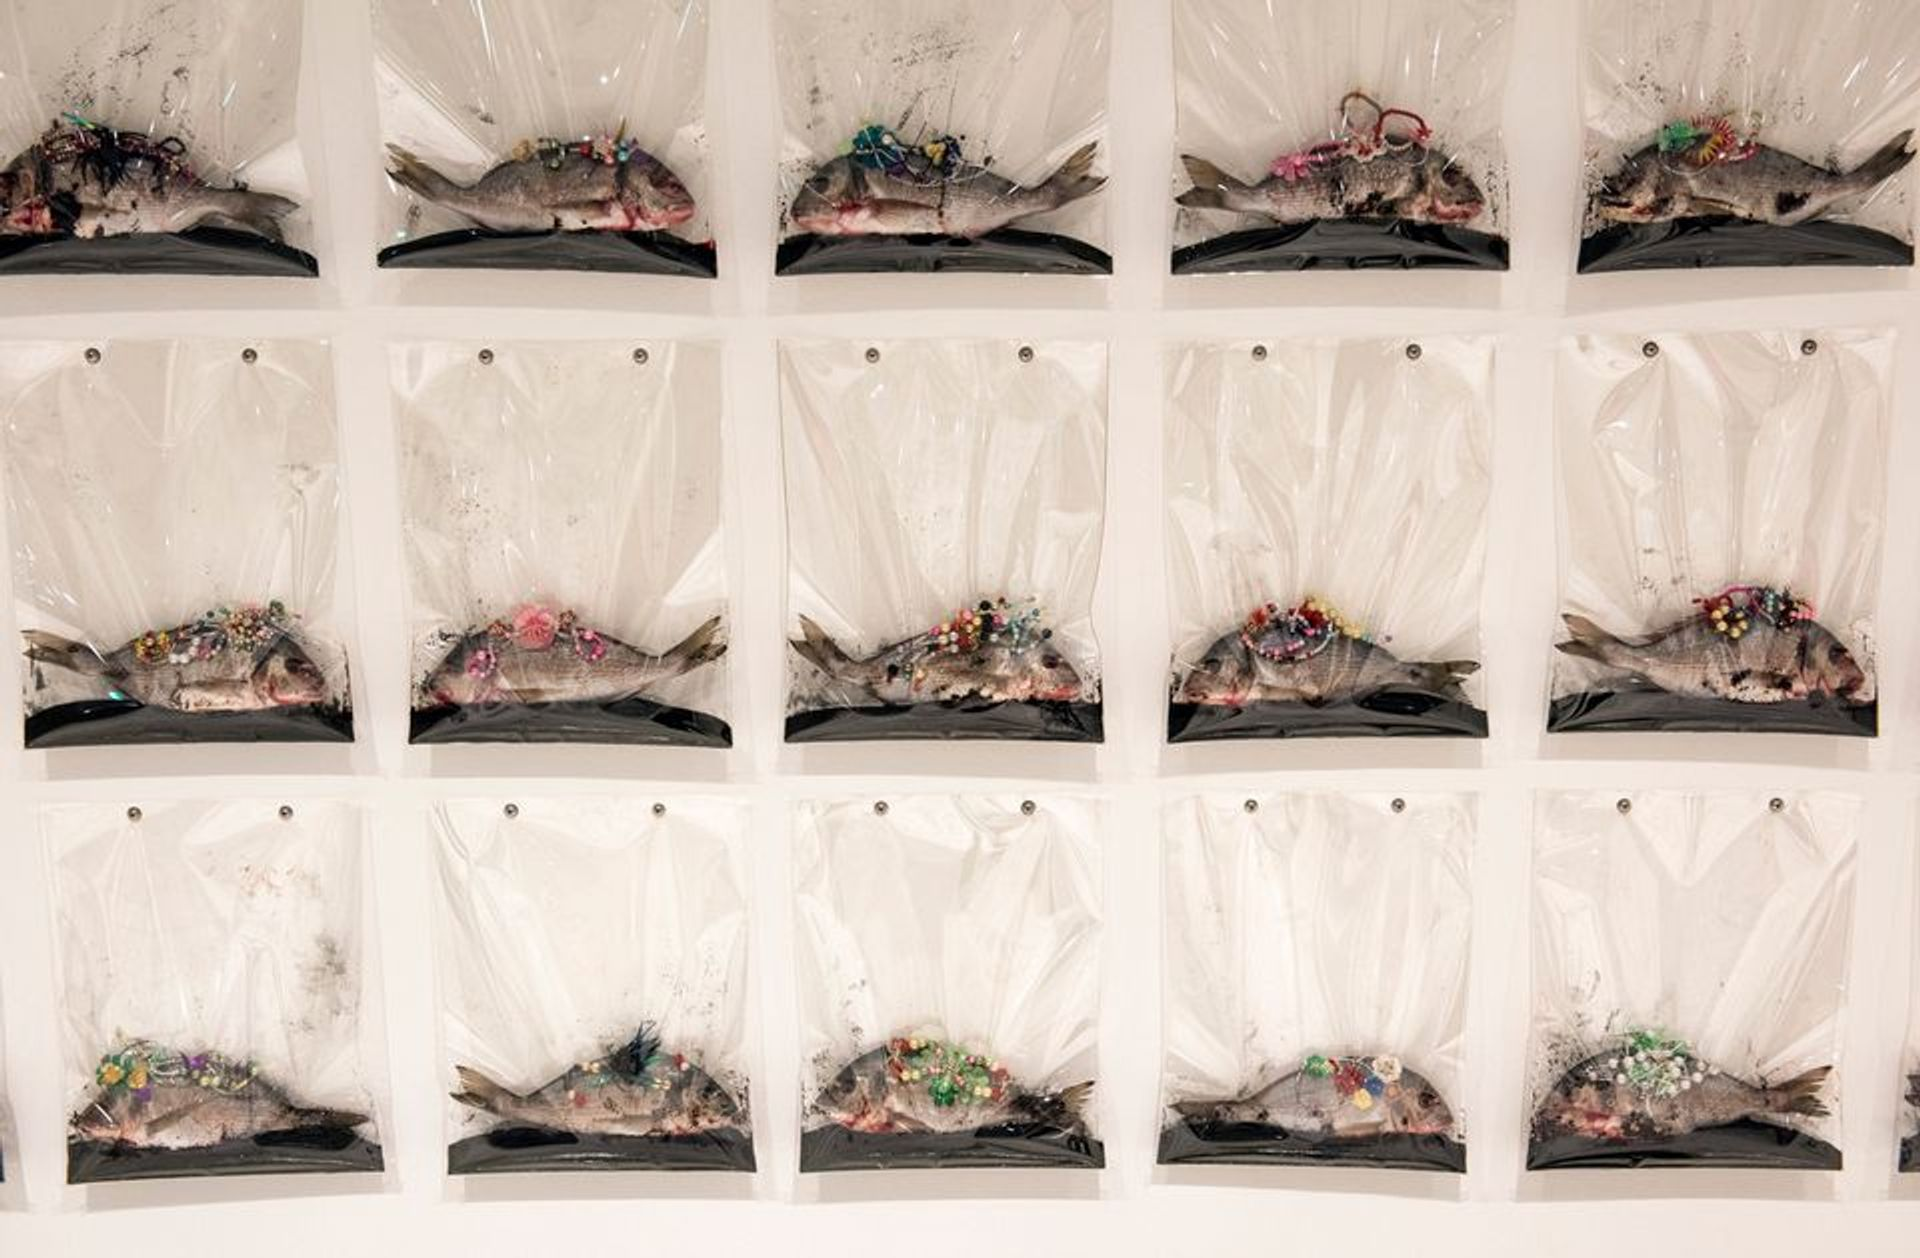 Lee Bul's Majestic Splendor (1991-2018) at the Hayward Gallery 2018 Lee Bul 2018; Photo: Linda Nylind